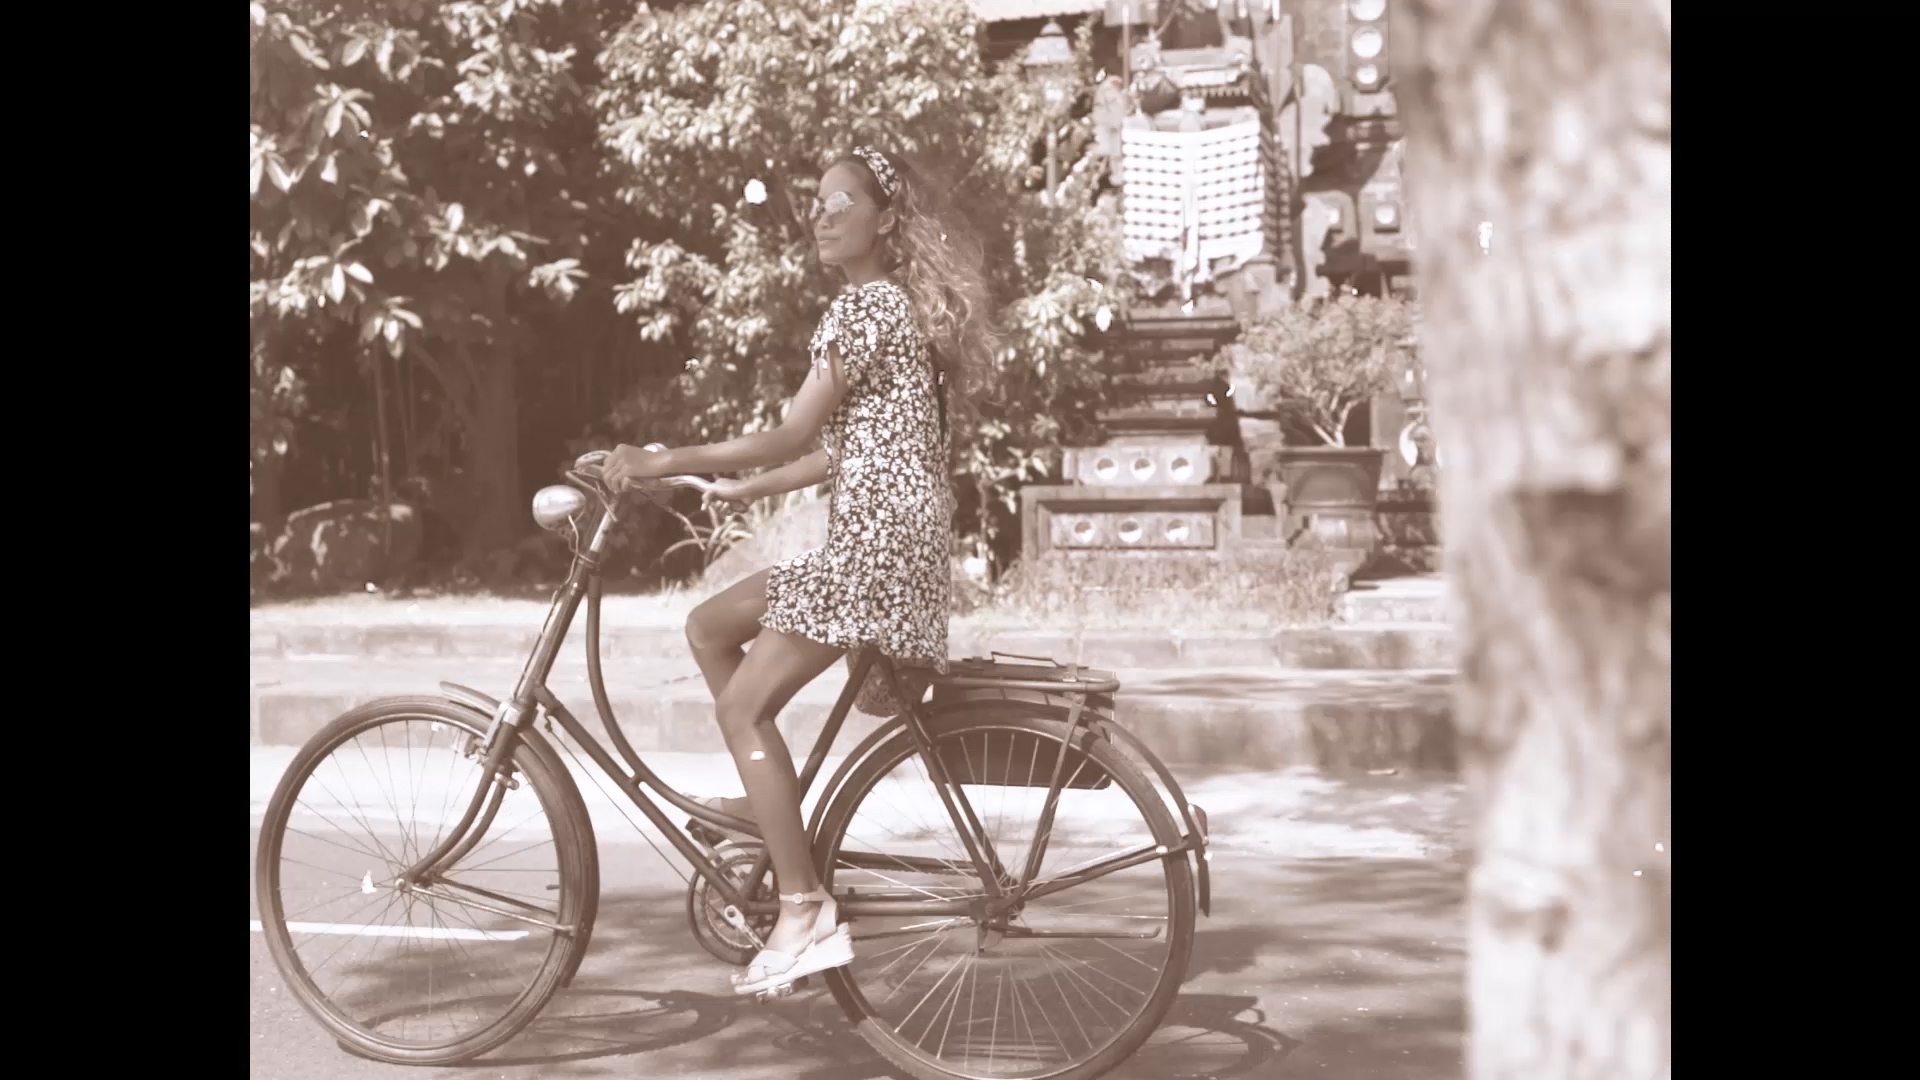 024-cyclingcommando-Putri-Cinta-teaser-stills-4.jpg